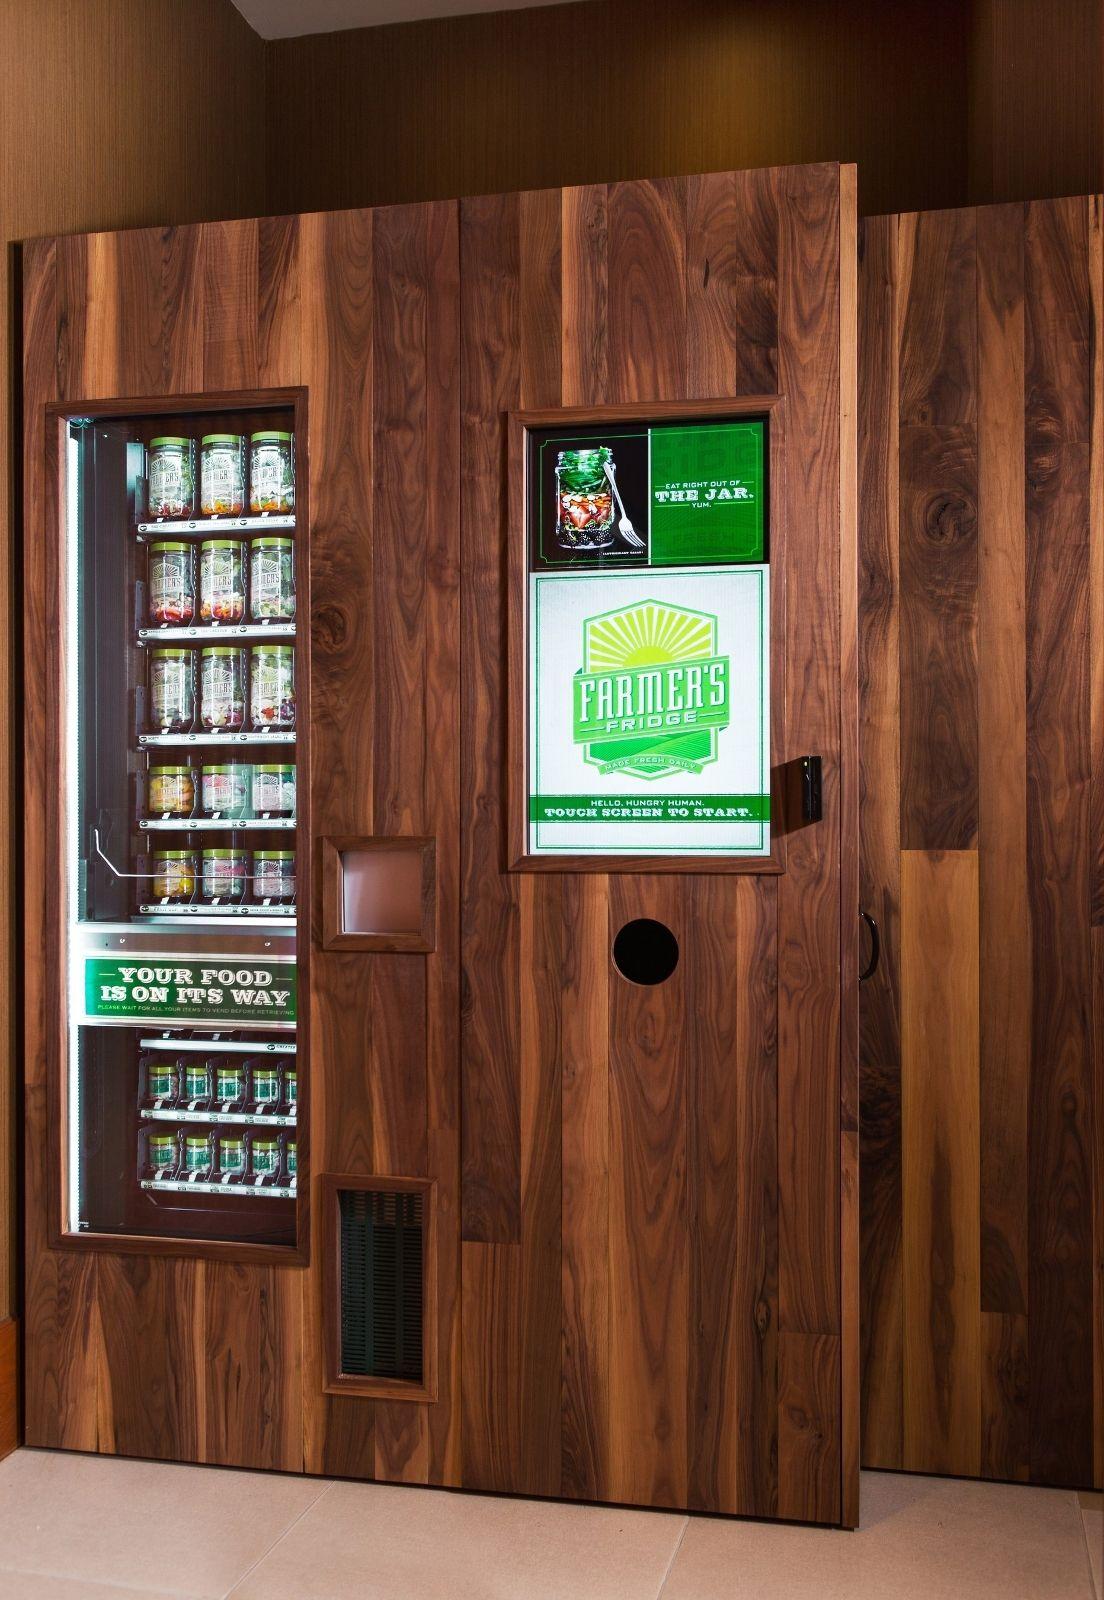 Hair accessories vending machines - Healthy Vending Machine Google Search